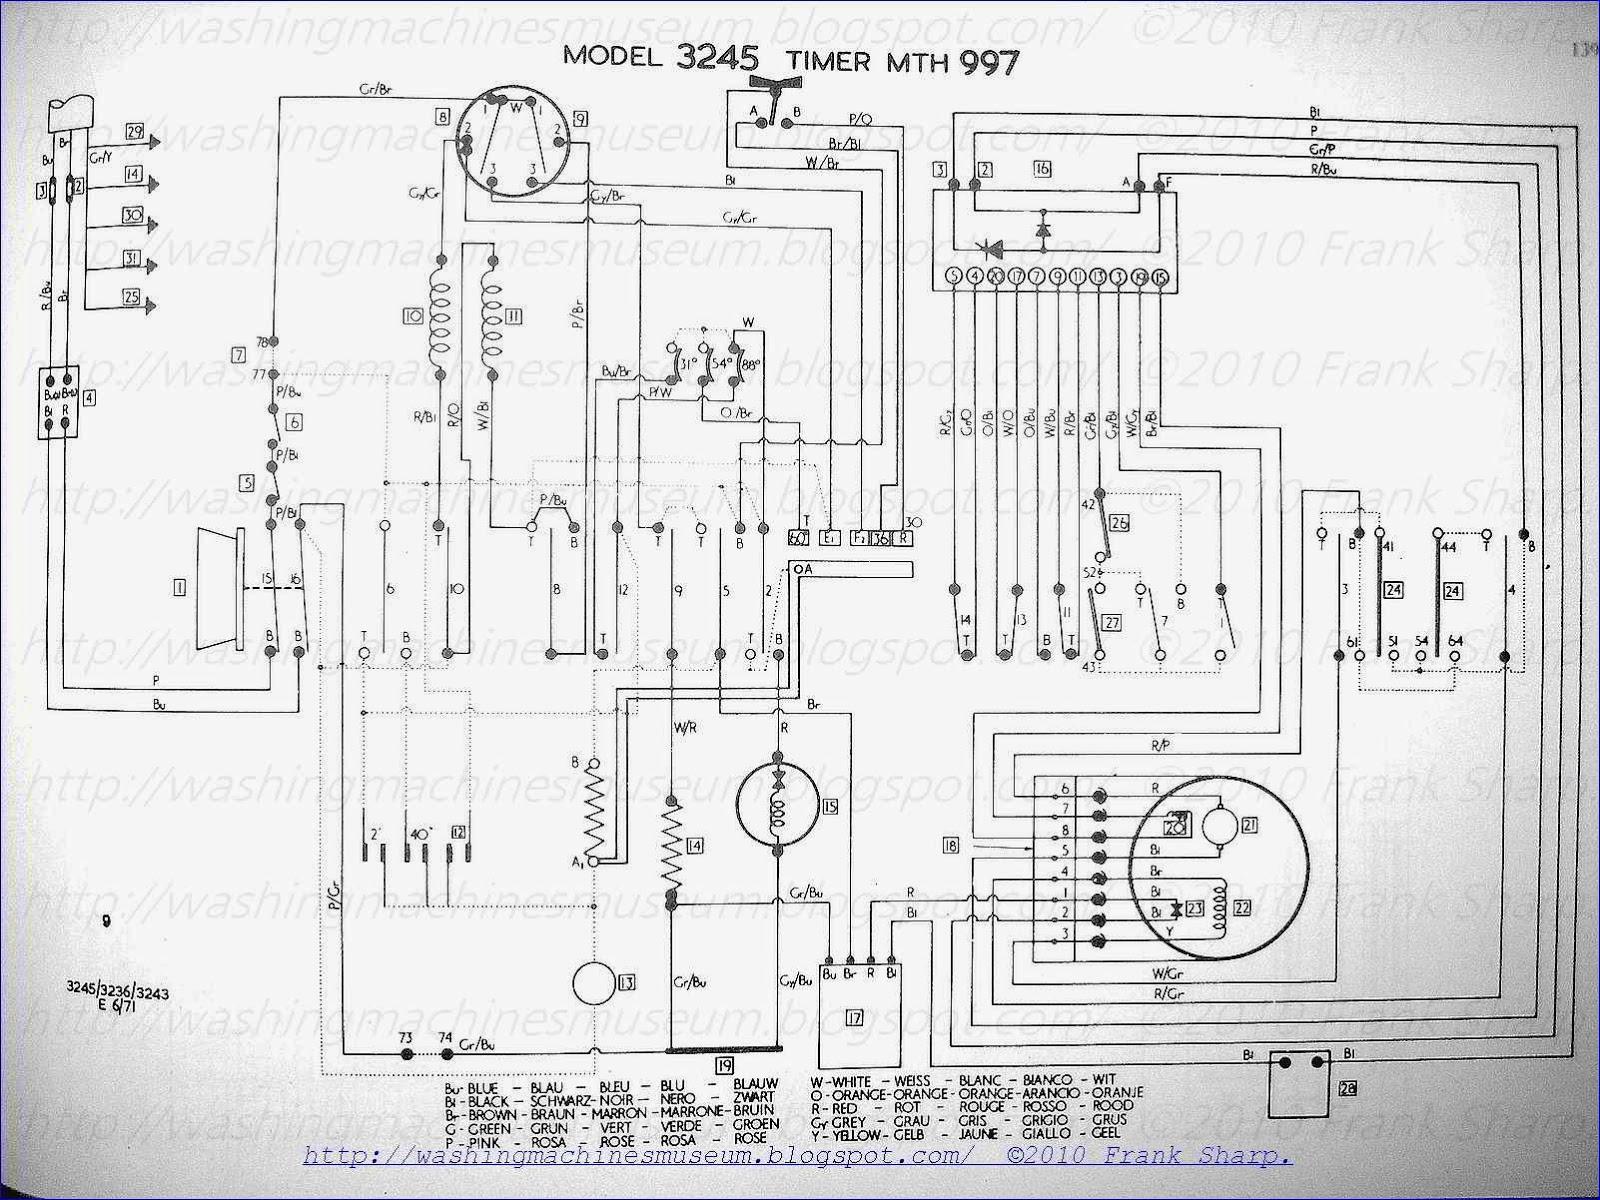 Washer Rama Museum: HOOVER MOD 3236  3243  3245